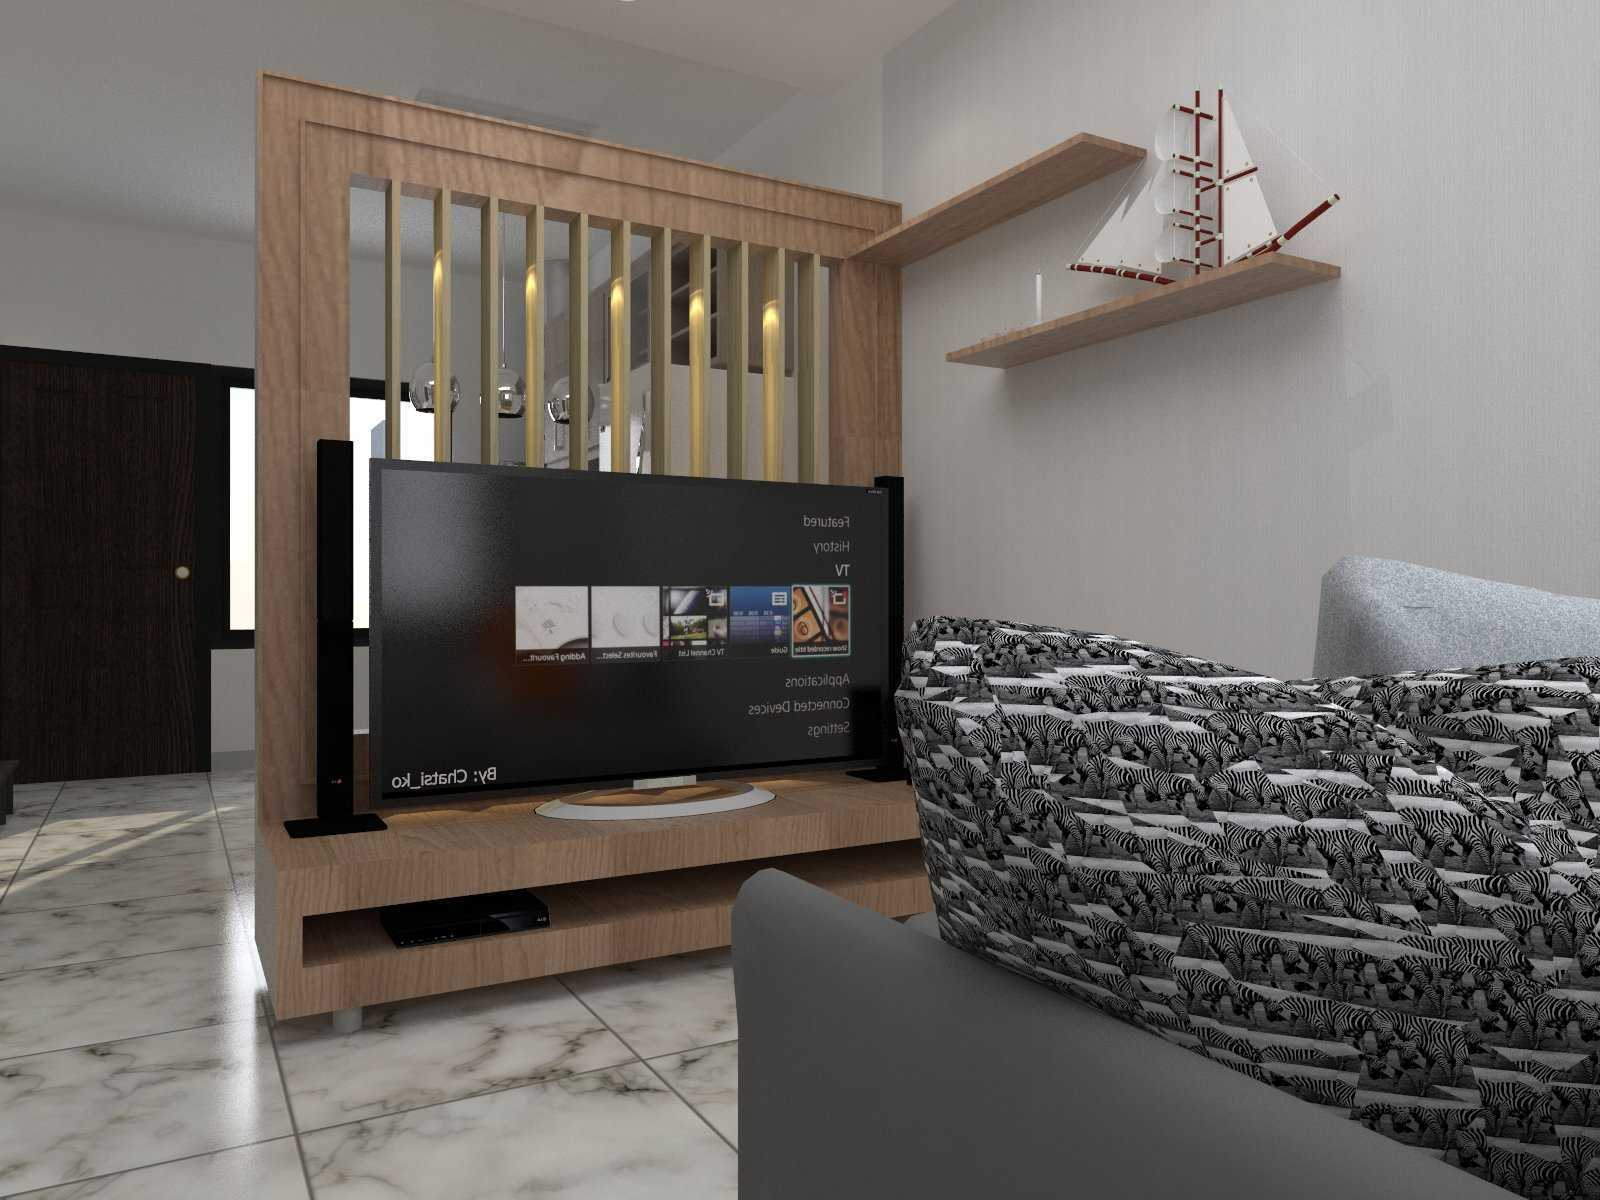 Archibox_Studio Apartemen Type Studio Jakarta, Daerah Khusus Ibukota Jakarta, Indonesia Jakarta, Daerah Khusus Ibukota Jakarta, Indonesia Archiboxstudio-Apartemen-Type-Studio   94458